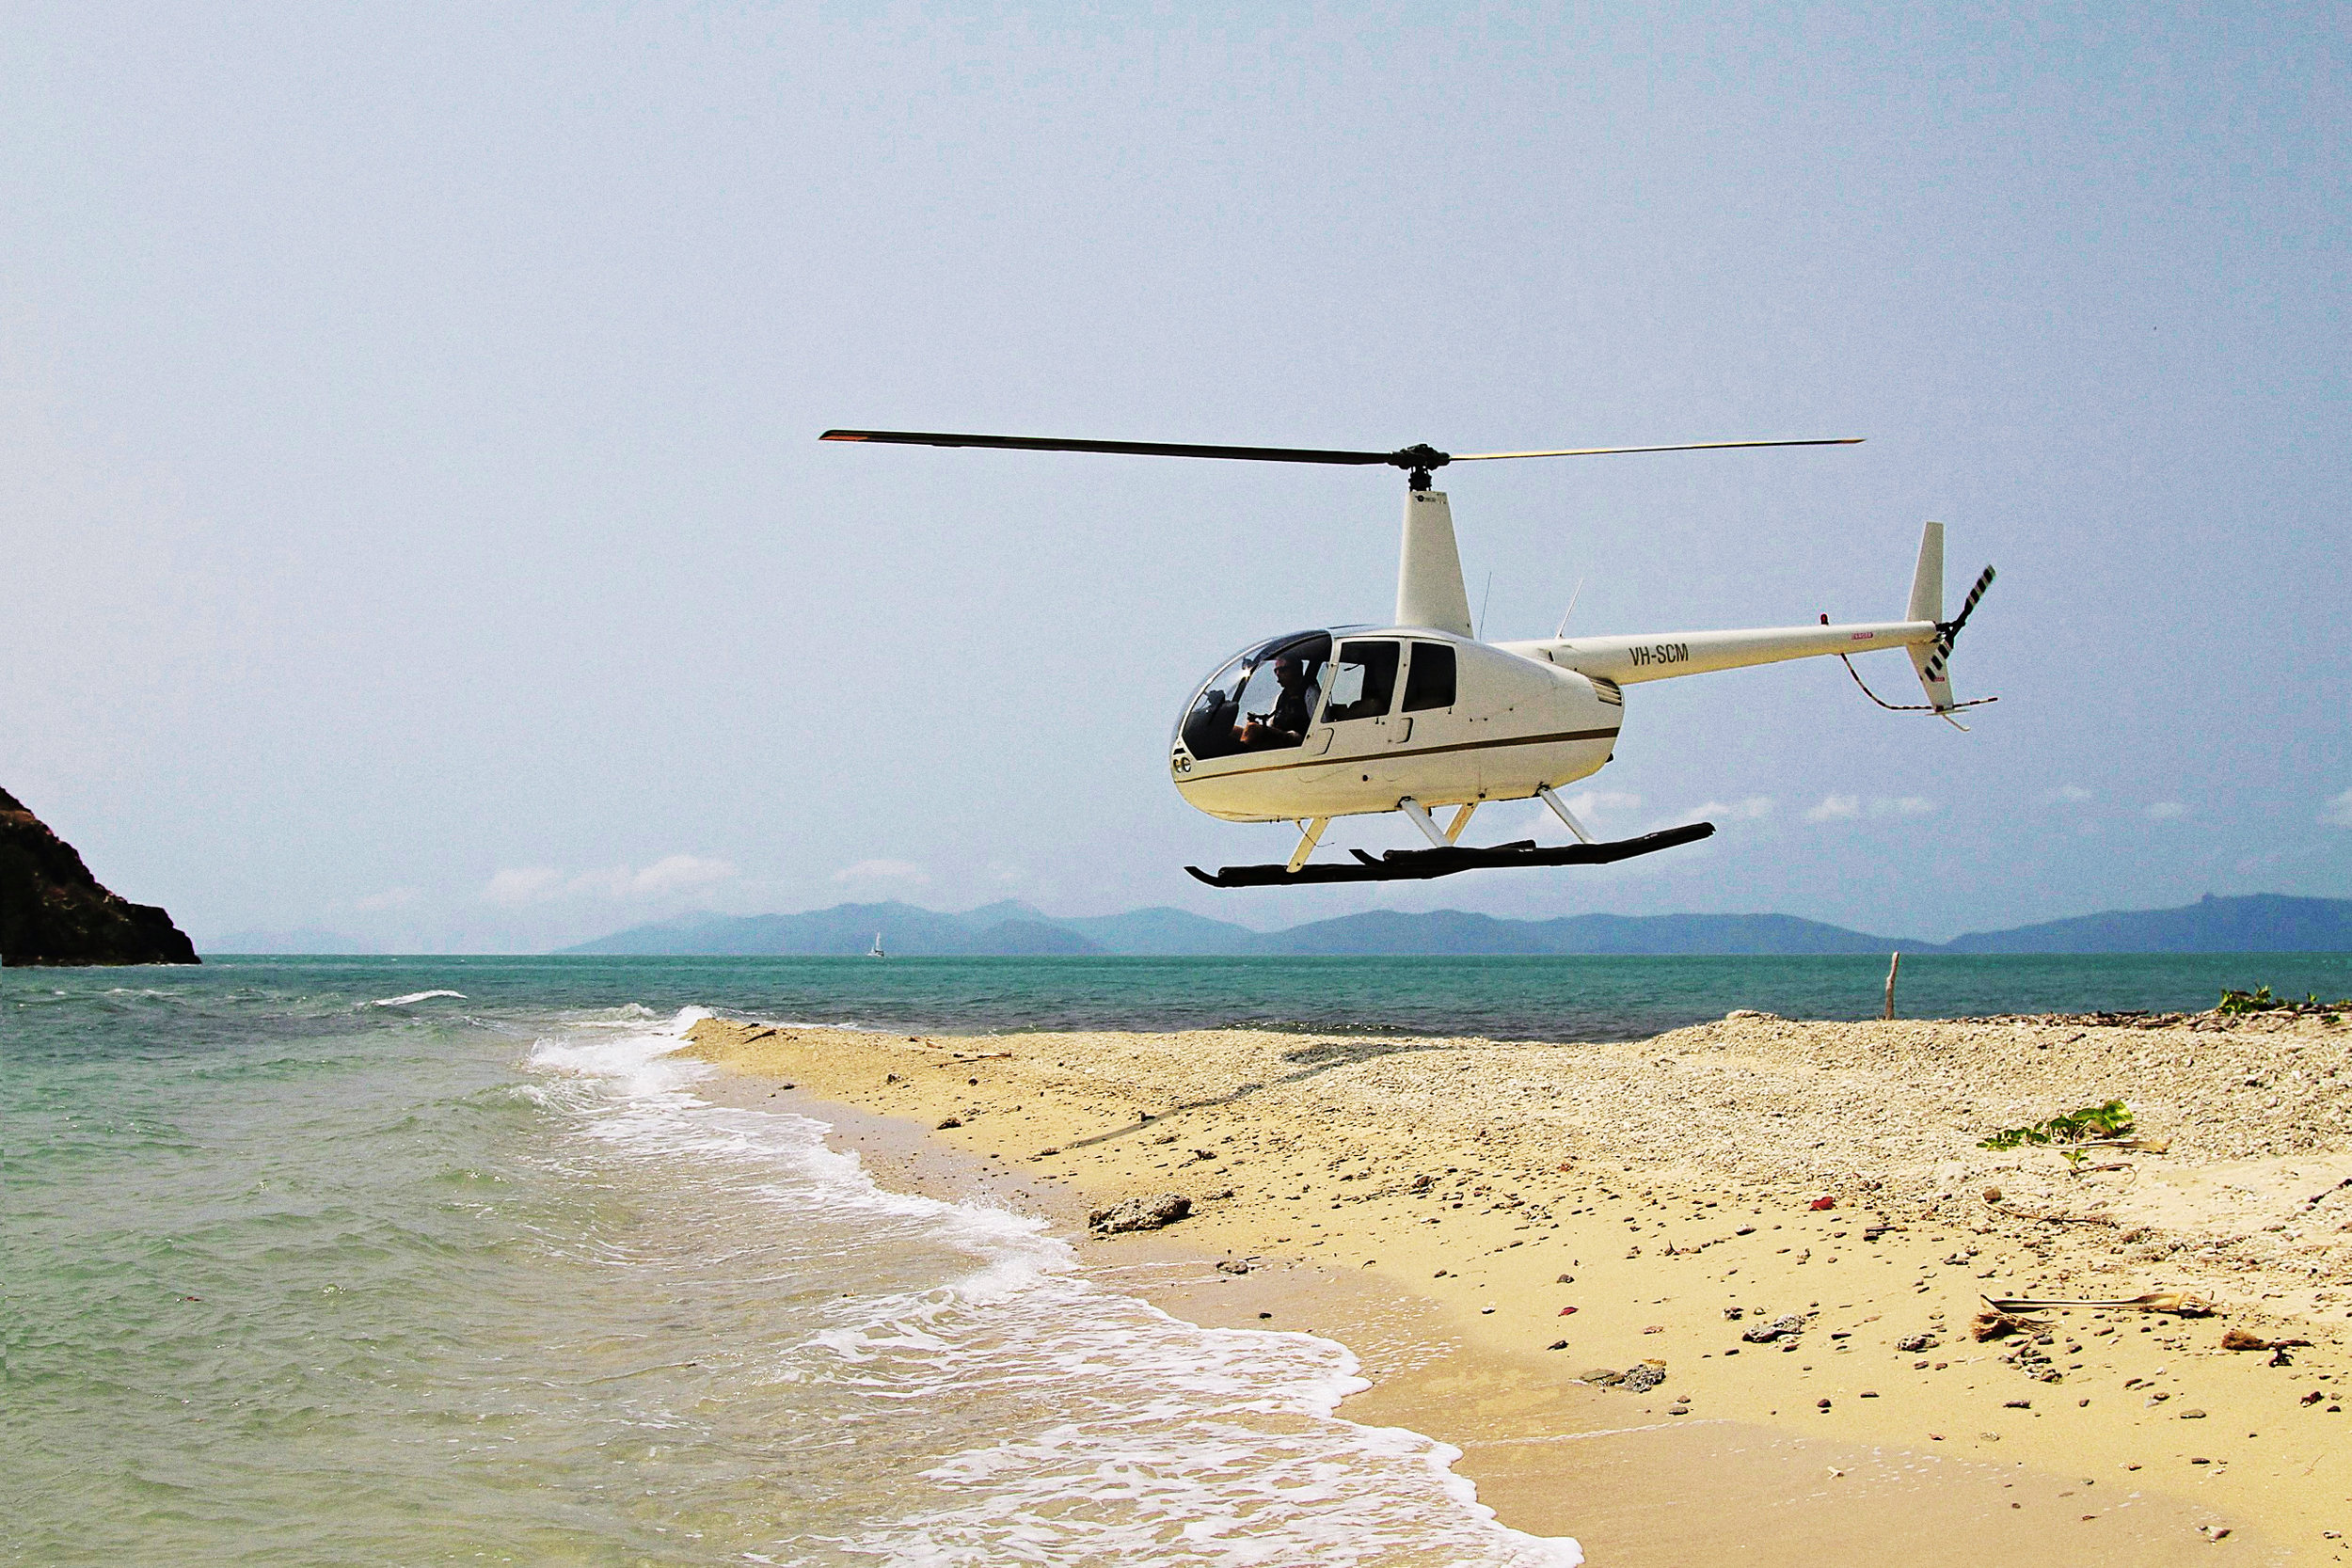 3.South_Molle_Is_heli-landing.jpg